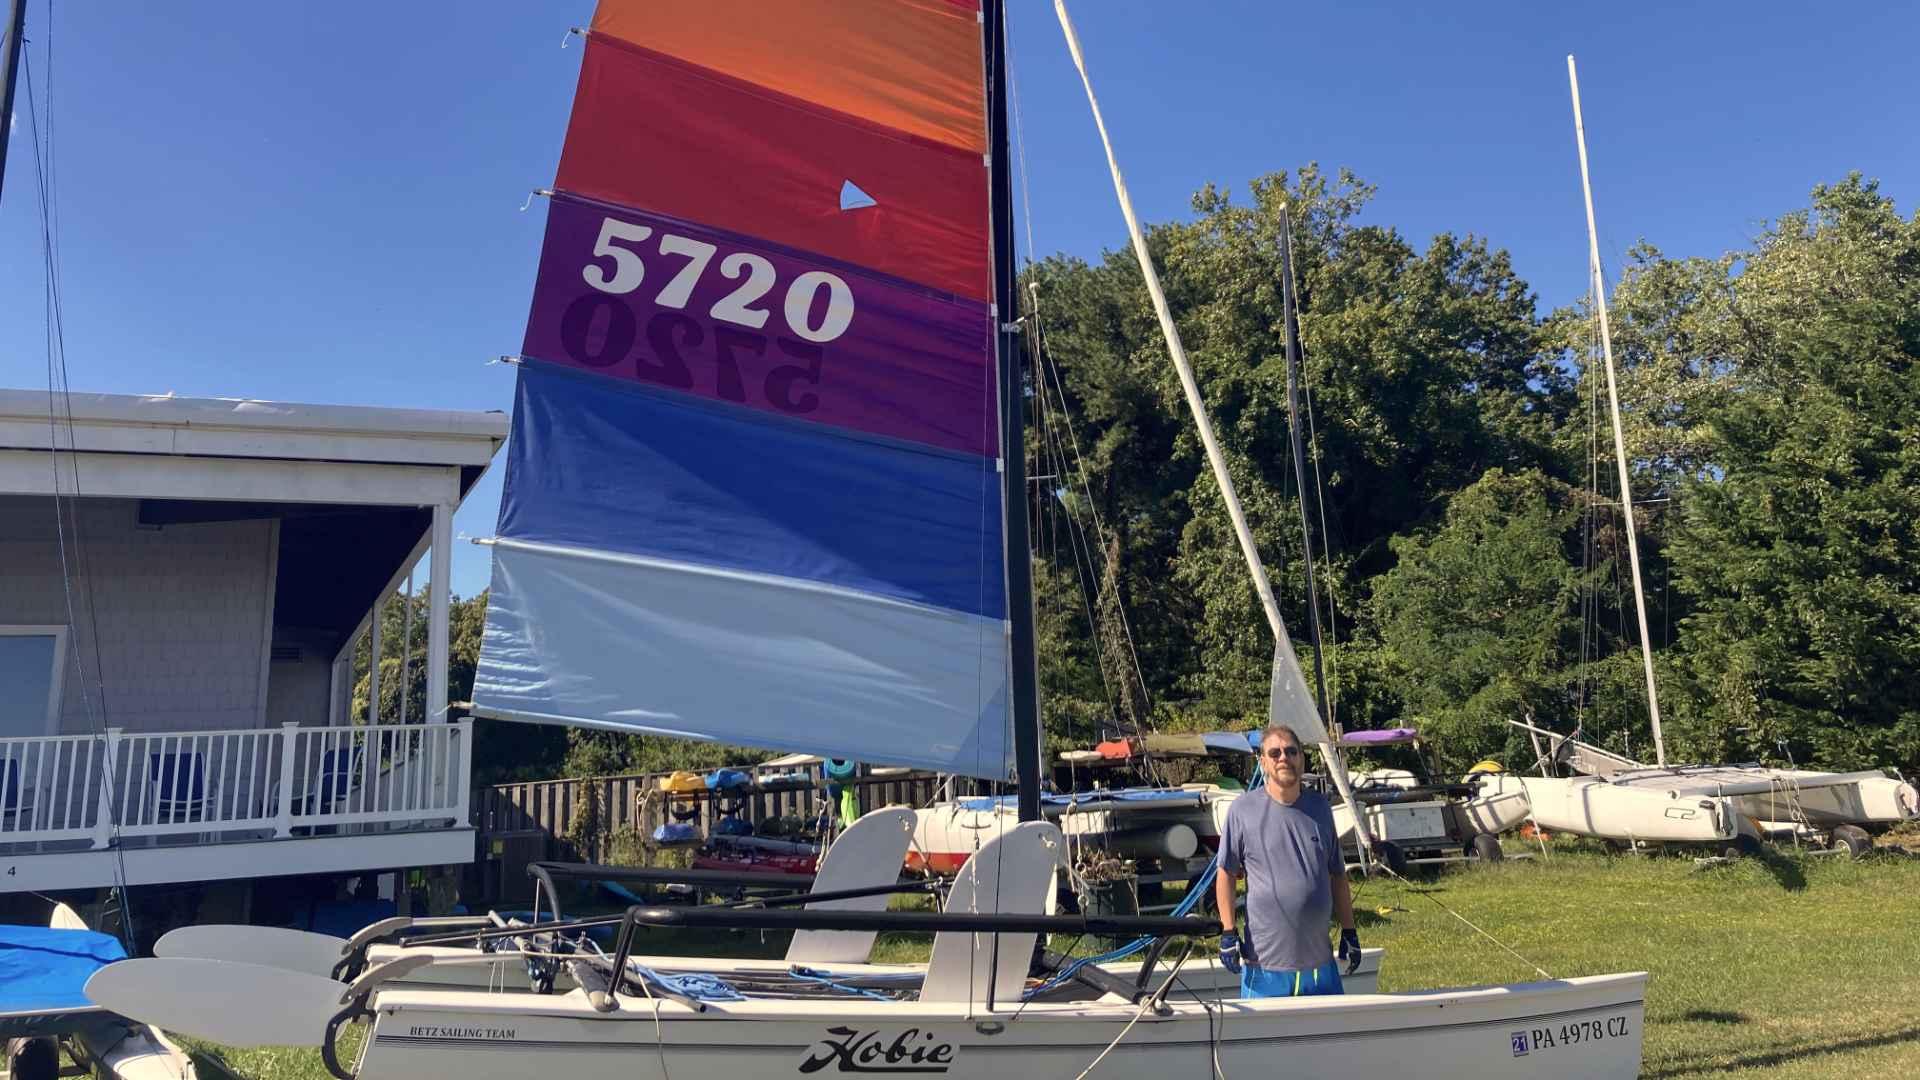 Last sailing day of the season on the Chesapeake Bay